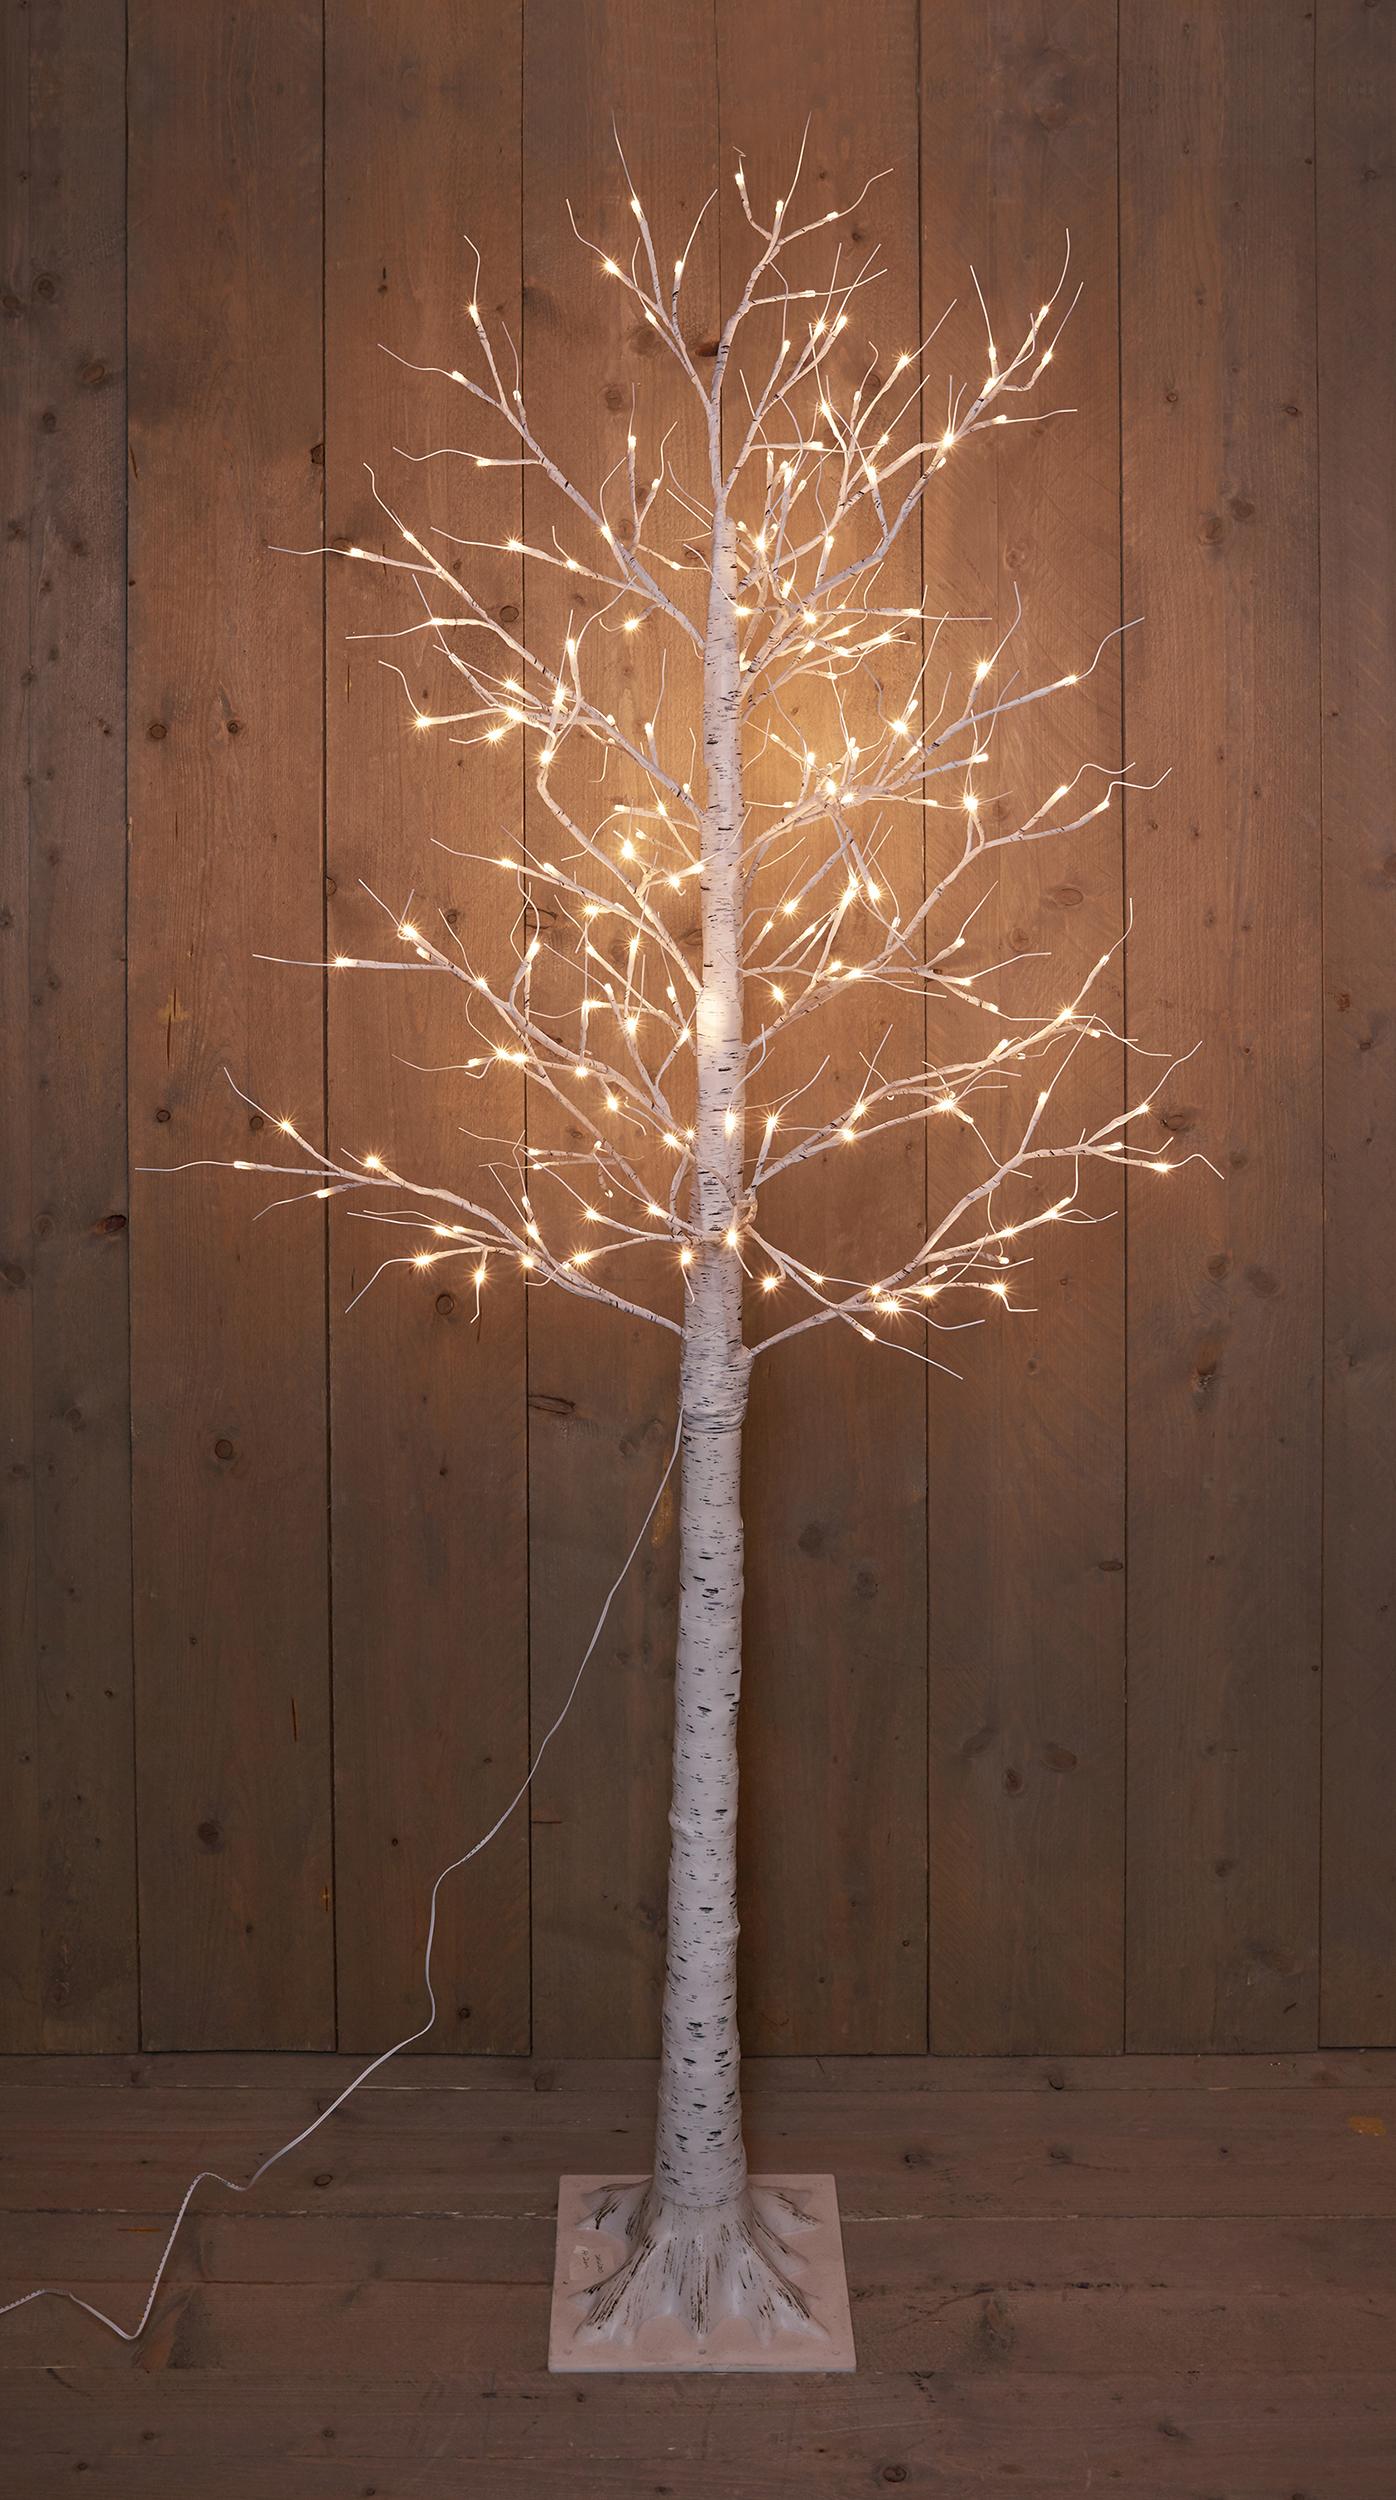 LED Birke warmweiß 200 cm Image